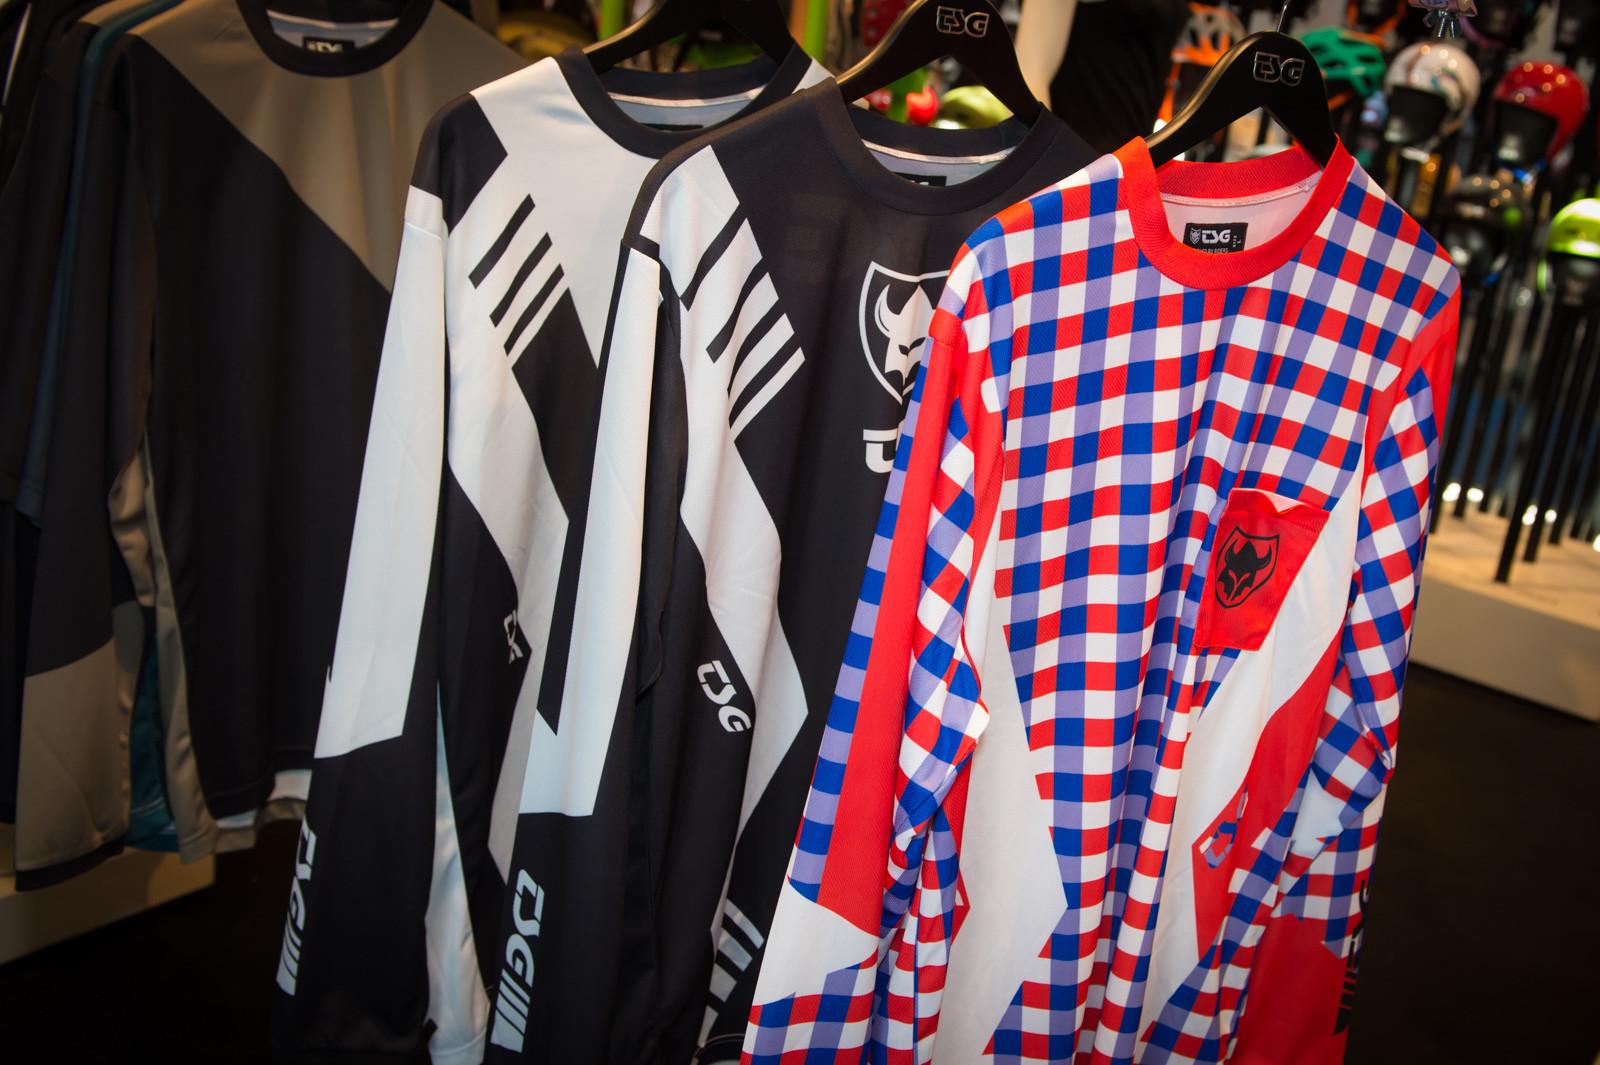 TSG Race Jersey - 2014 Mountain Bike Apparel & Protection at Eurobike 2013 - Mountain Biking Pictures - Vital MTB